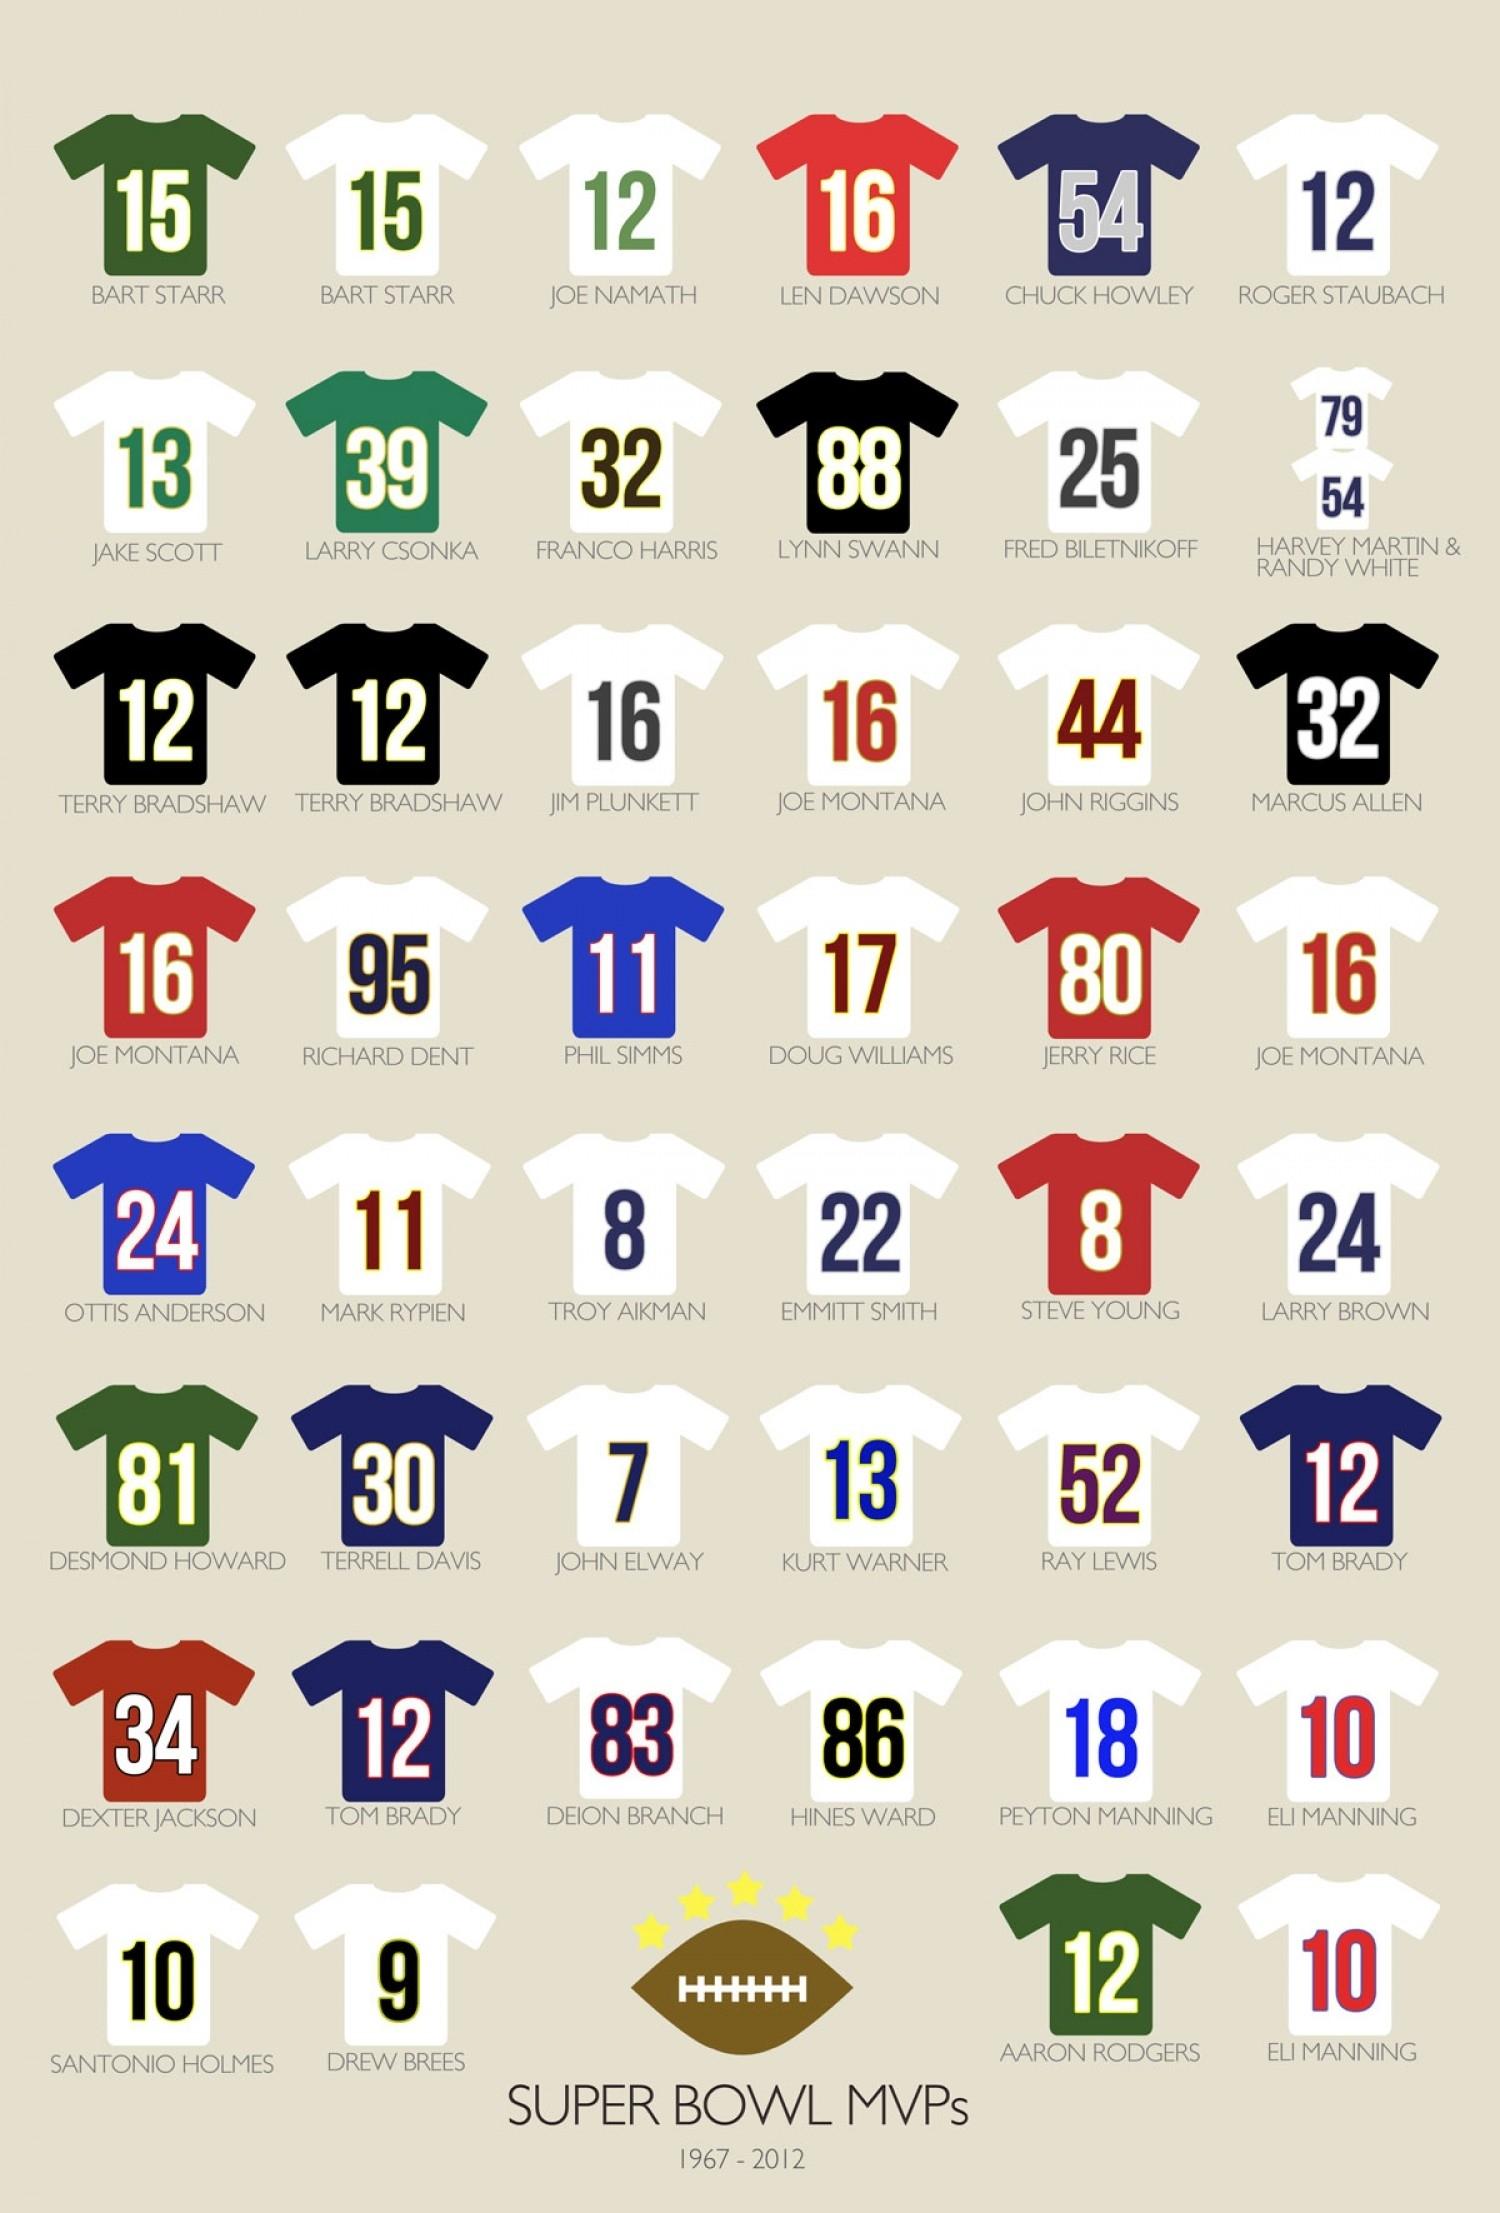 The 25 Biggest Super Bowl Mvp Snubs with Super Bowl Mvp Vote Text Number